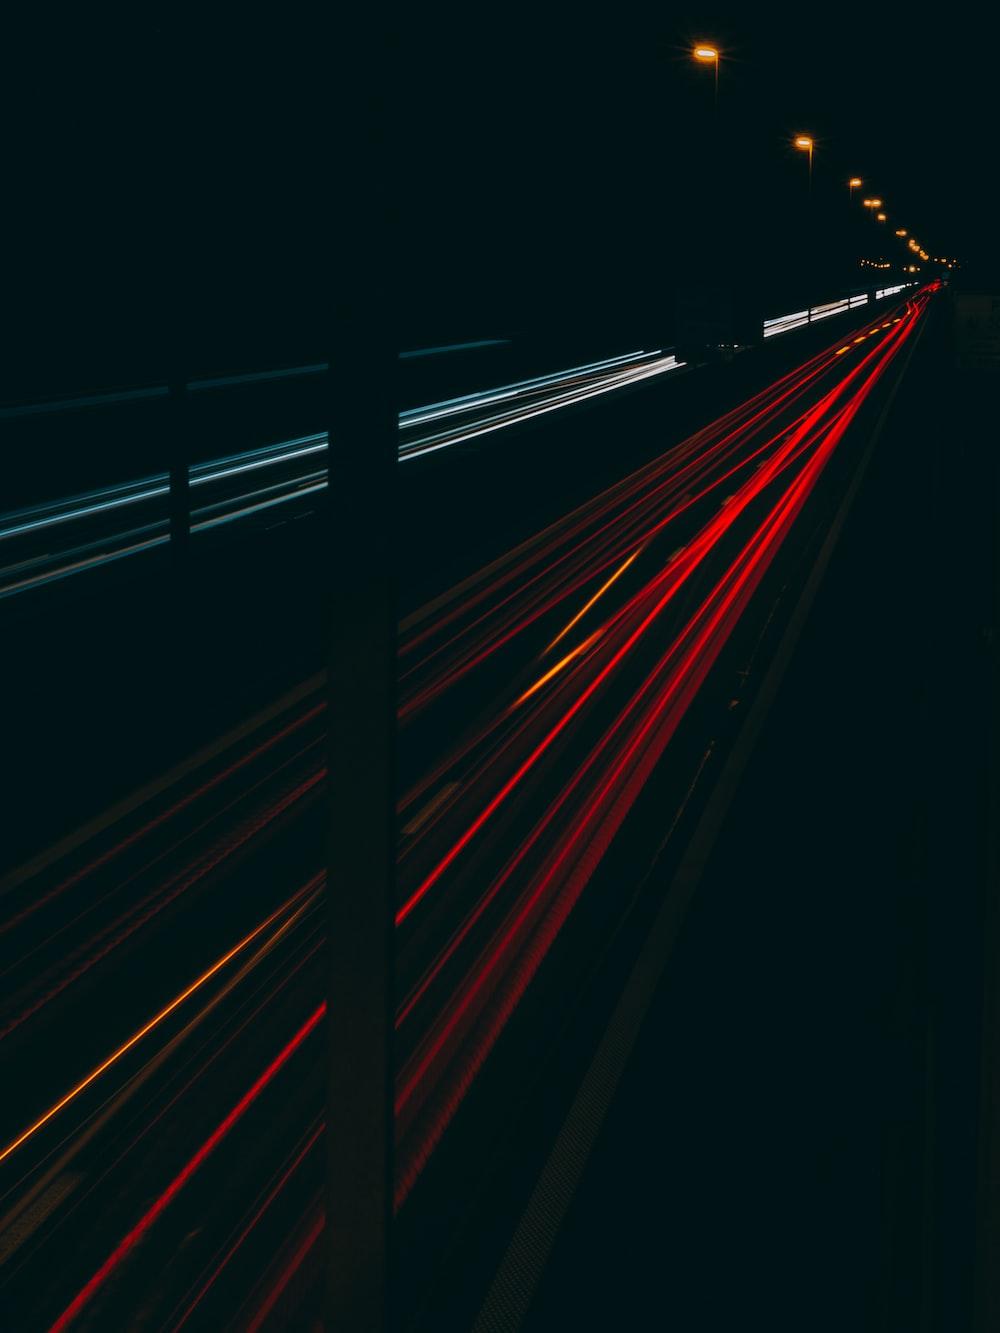 red and black light streaks